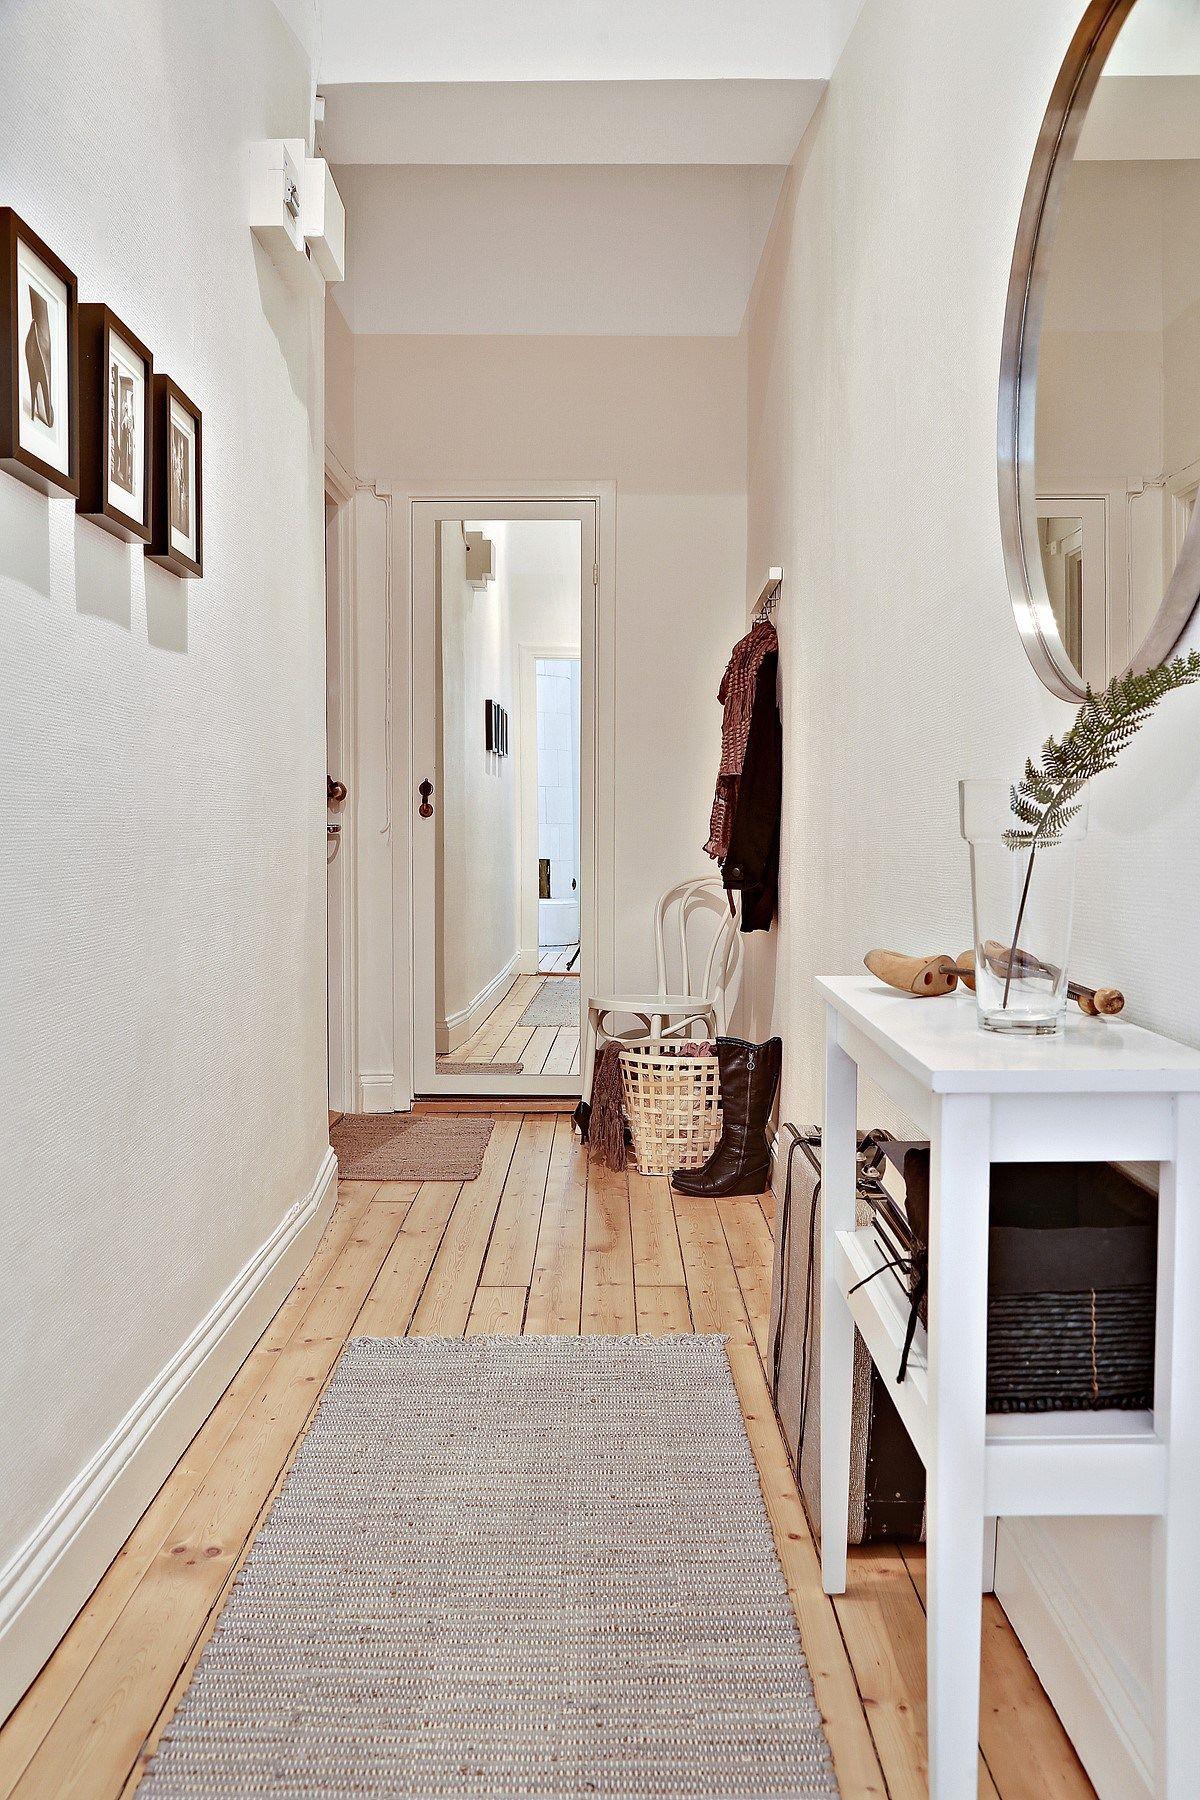 5 astuces pour agencer et aménager son couloir